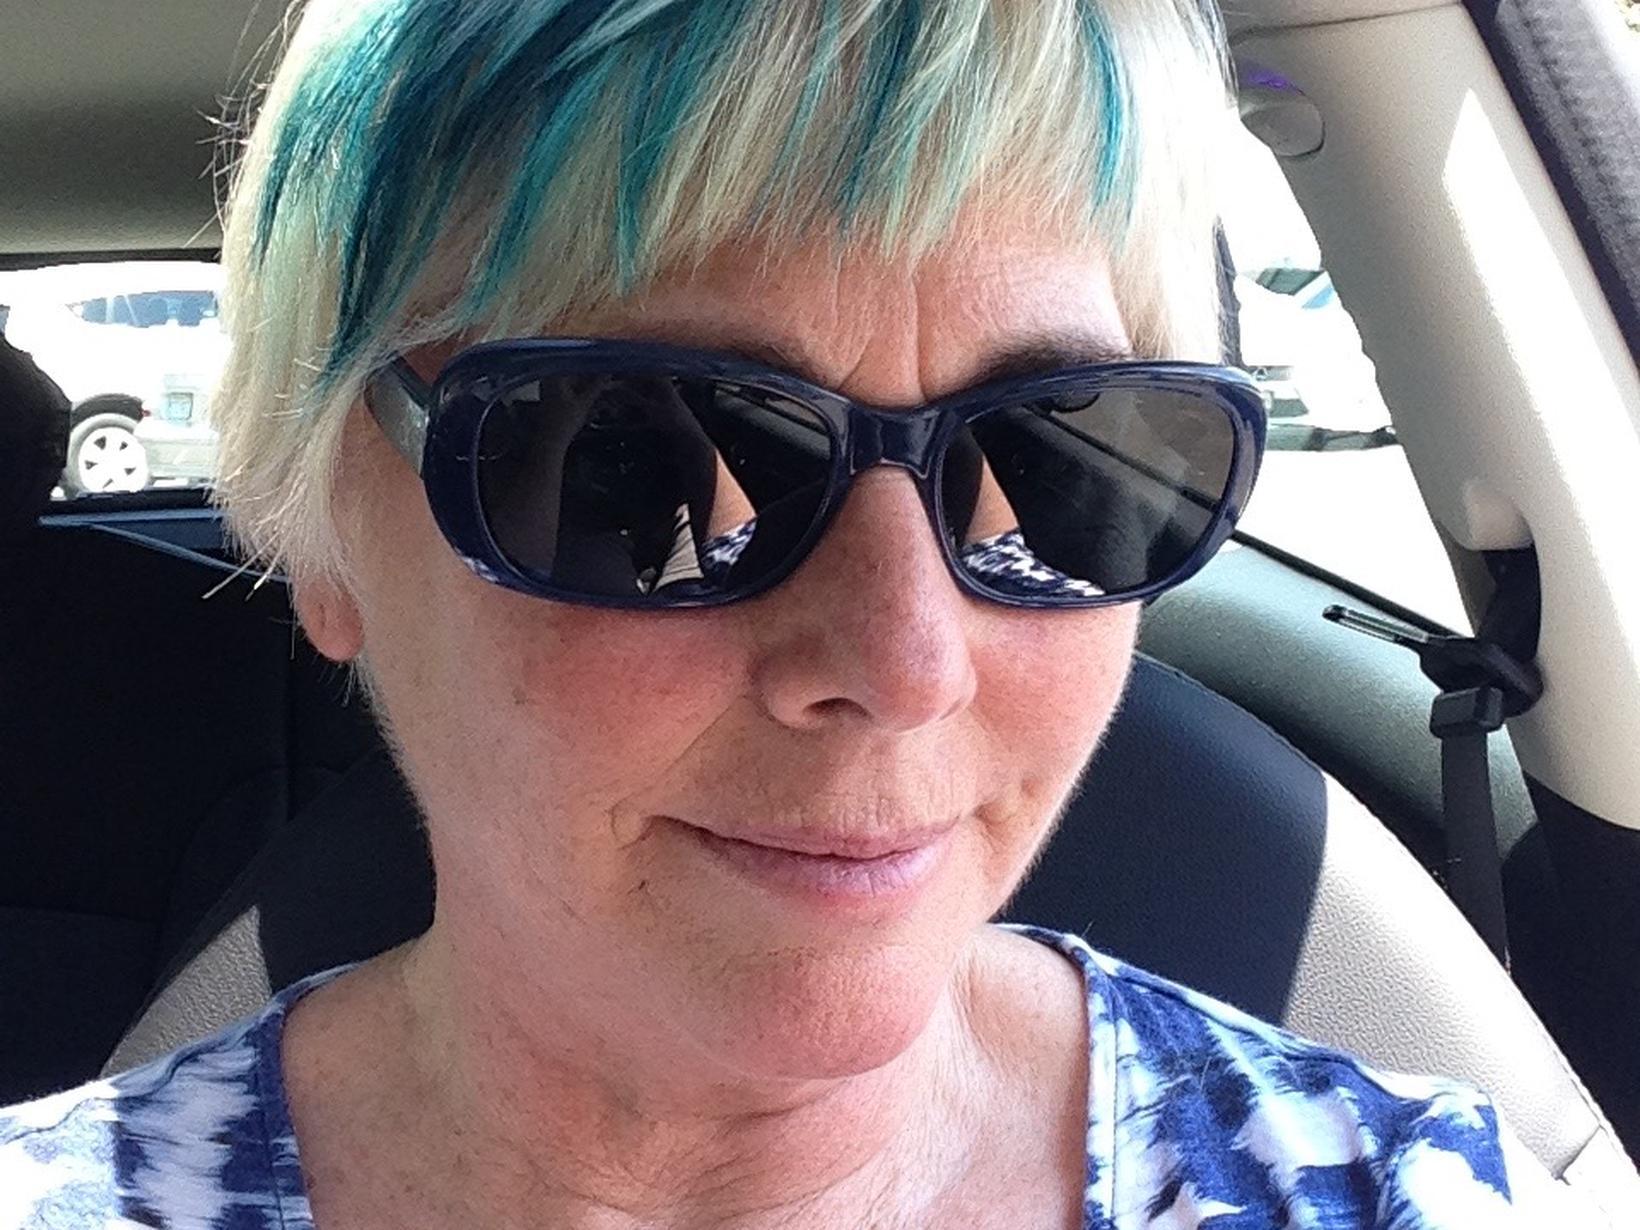 Kathy jo from Boston, Massachusetts, United States